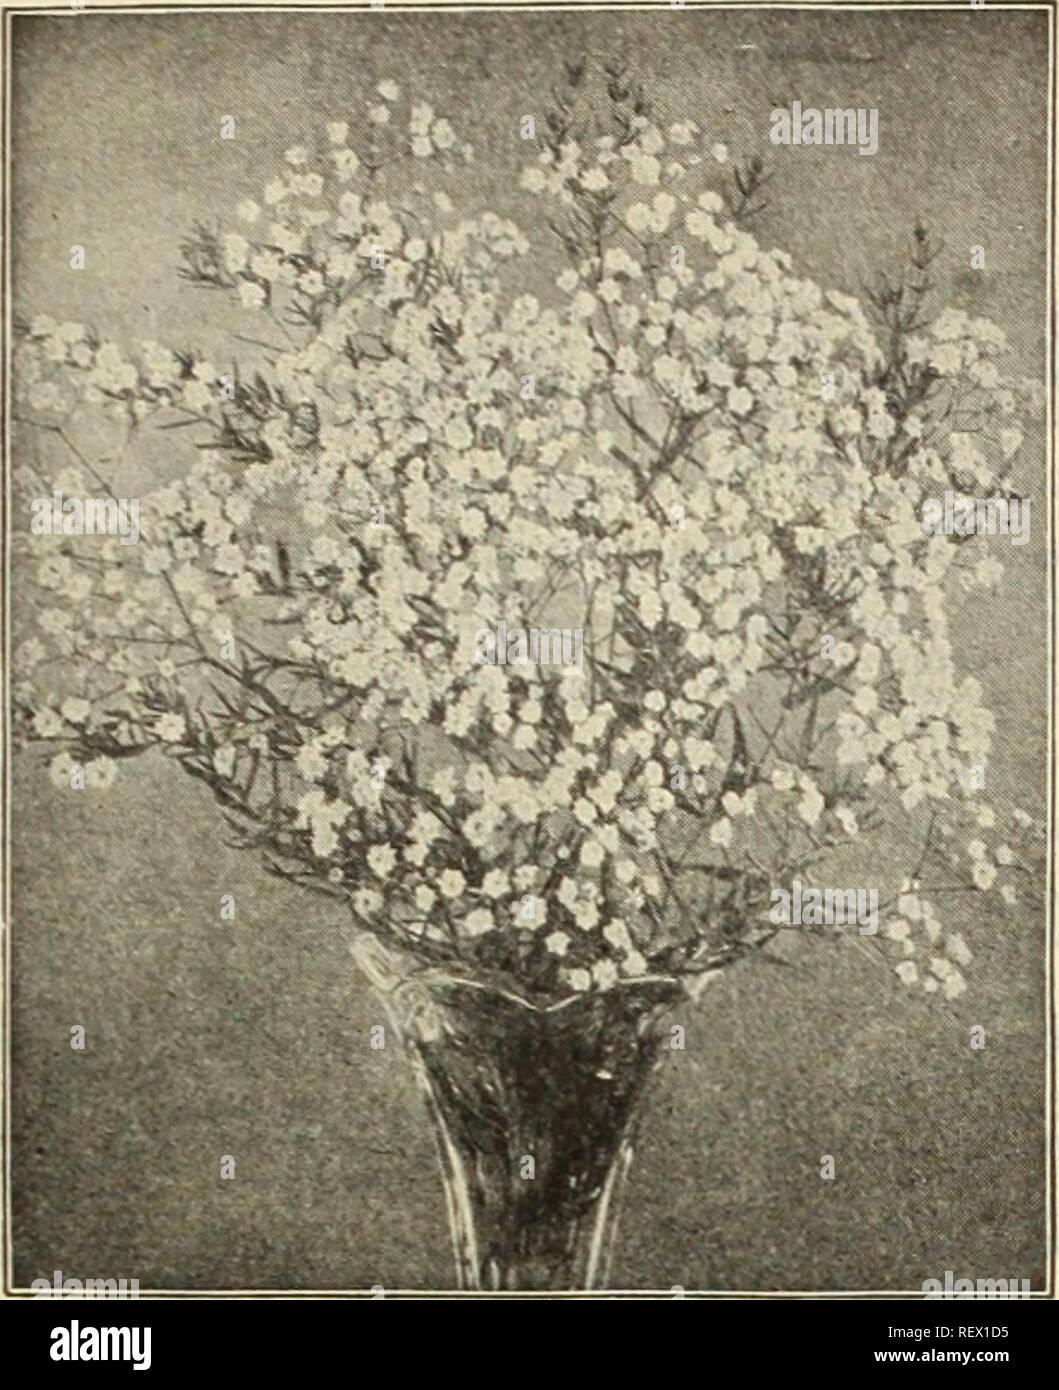 . Dreer's wholesale price list : seeds, plants, bulbs, etc. Bulbs (Plants) Catalogs; Flowers Seeds Catalogs; Vegetables Seeds Catalogs; Nurseries (Horticulture) Catalogs; Gardening Equipment and supplies Catalogs. HENRY A. DREER, PHILADELPHIA. PA., WHOLESALE PRICE LIST 45. GYPSOPHILA PANICULATA, FL. PL. Ornamental Hardy Bamboos. Each Doz. Metake Simoni Viminalis Fortunel Variegata. 60 50 50 25 $6 00 5 00 5 00 2 50 Fastuosa Aurea . Henonis . Aurlcoma Each Doz. 60 t6 00 60 6 00 60 6 00 60 6 00 Gunnera. Scabra. Fine strong plants in 5-inch pots of this grand foliage plant. 35 cents each; $3.50 pe Stock Photo